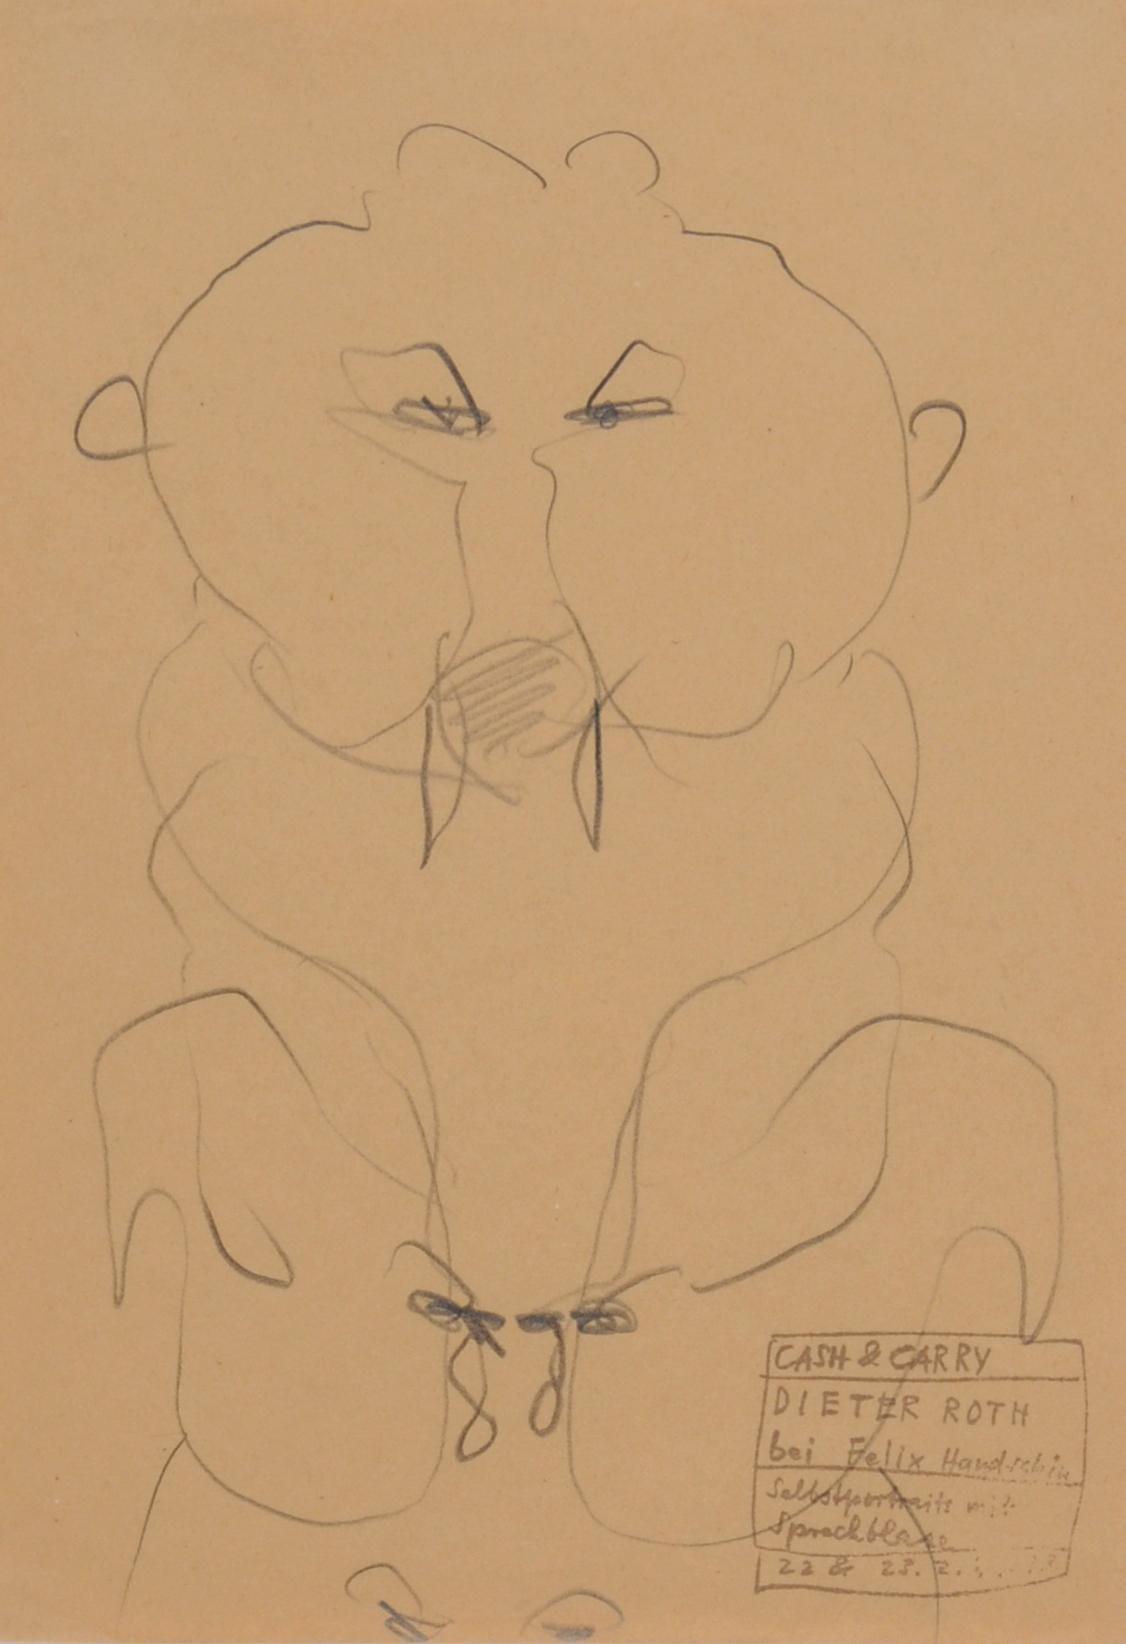 Roth Dieter, 3 drawings: Cash and Carry, Dieter Roth bei Felix Handschin, Selbstportraits mit Sprechblase